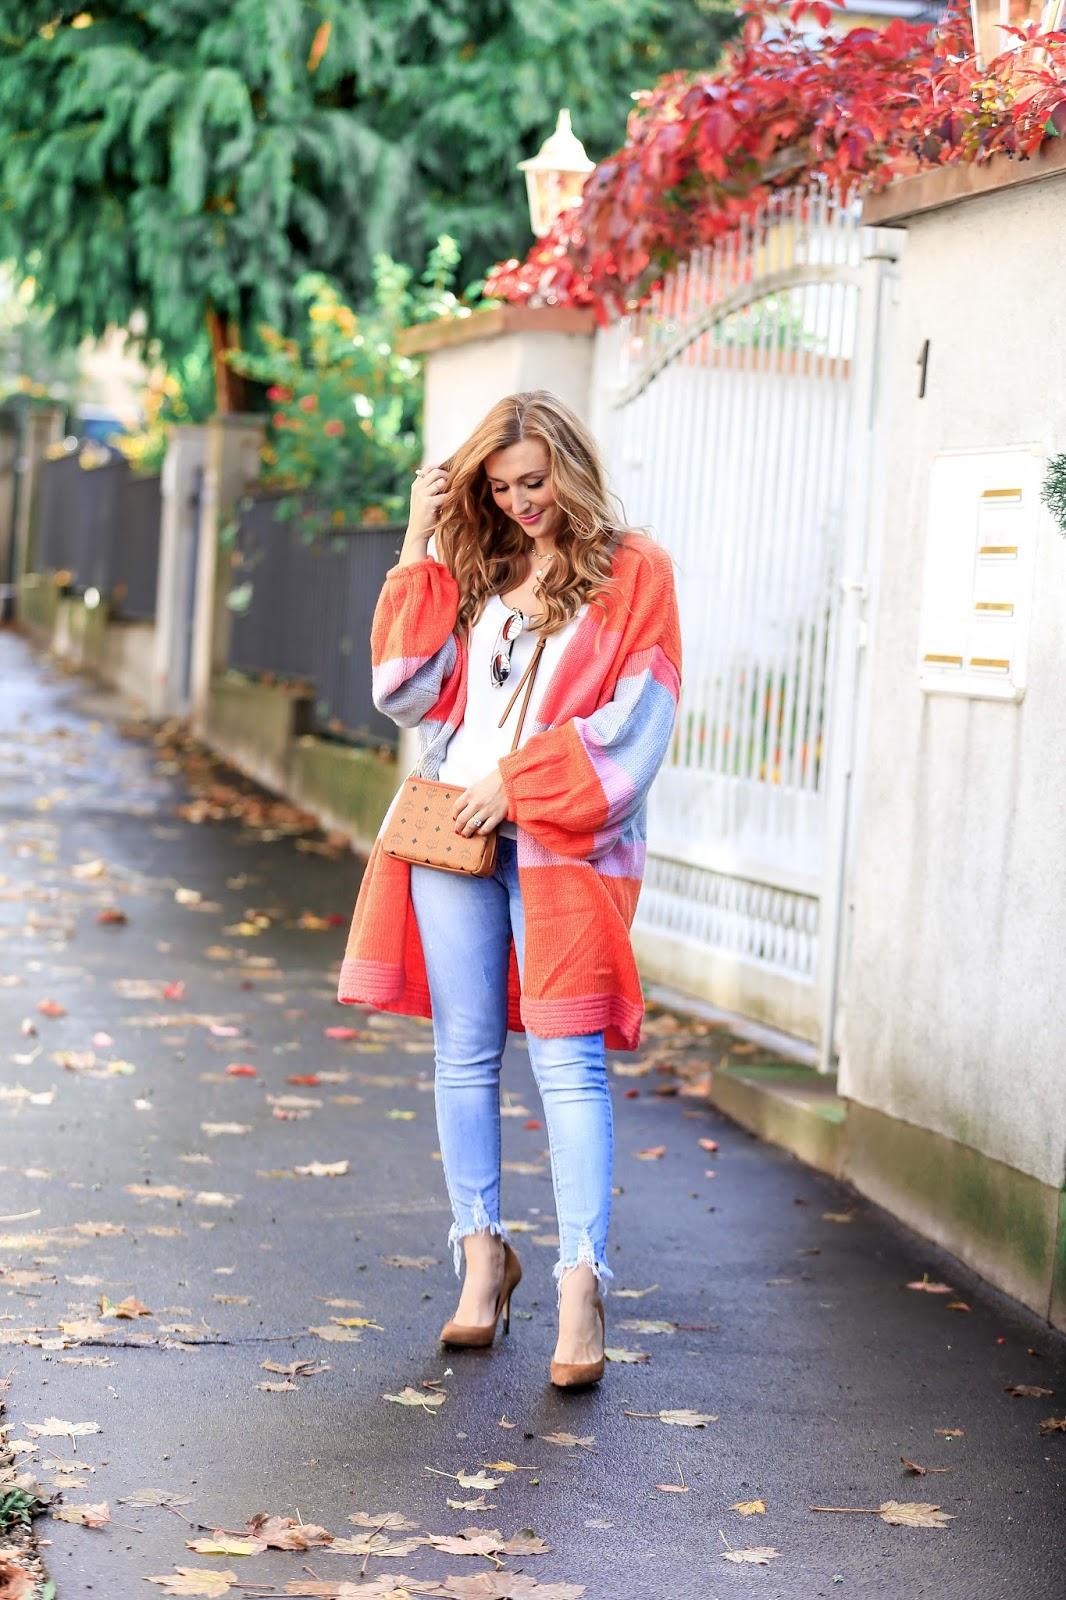 Helle-78Jeans-Bunter-cardigan-Fashionstylebyjohanna-blogger-Frankfurt-deutschlandfashionblog-outfit-ootd-wildleder-pumps-Asostrend-beige-altrosa-oversize-cardigan-bunt-jeans-pailletten-top-chanel-camera-vintage-mcm-tasche